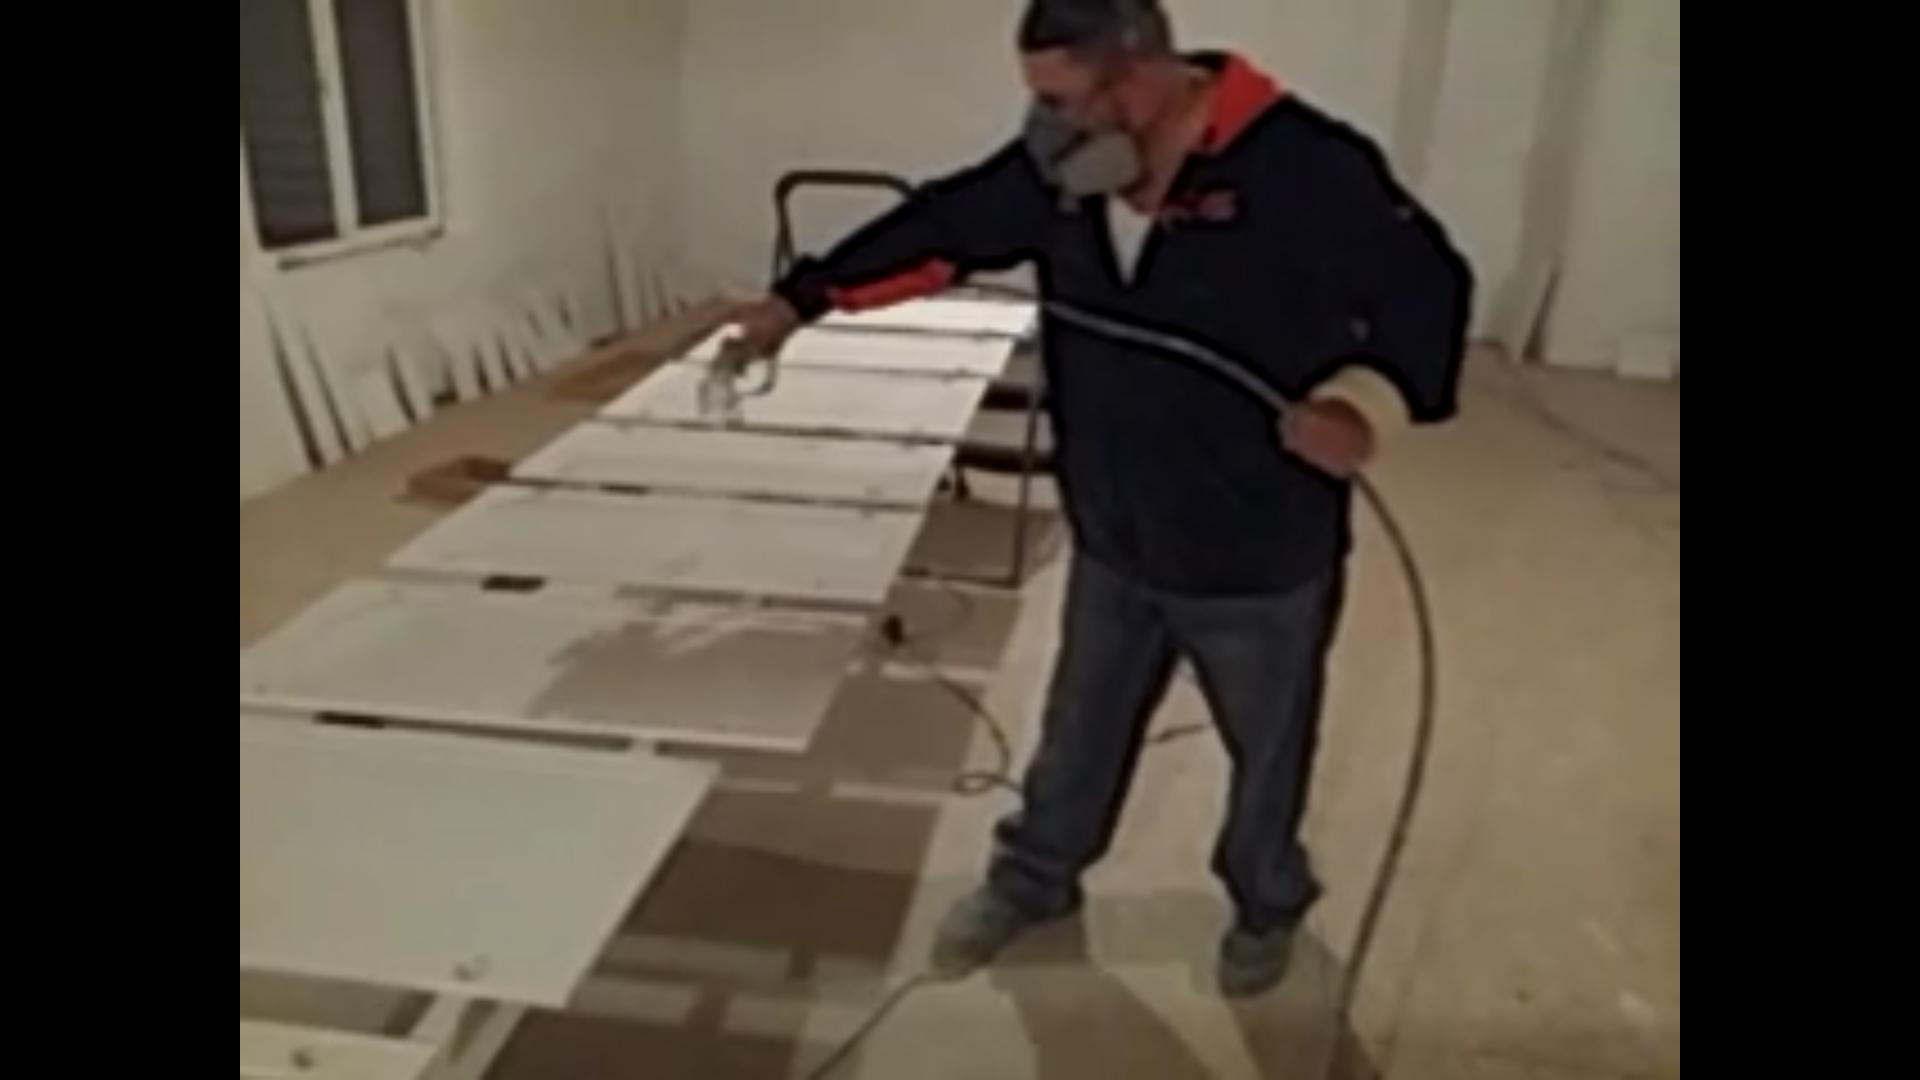 Kitchen cabinet refinishing denver co - Painting Kitchen Cabinets Denver Co